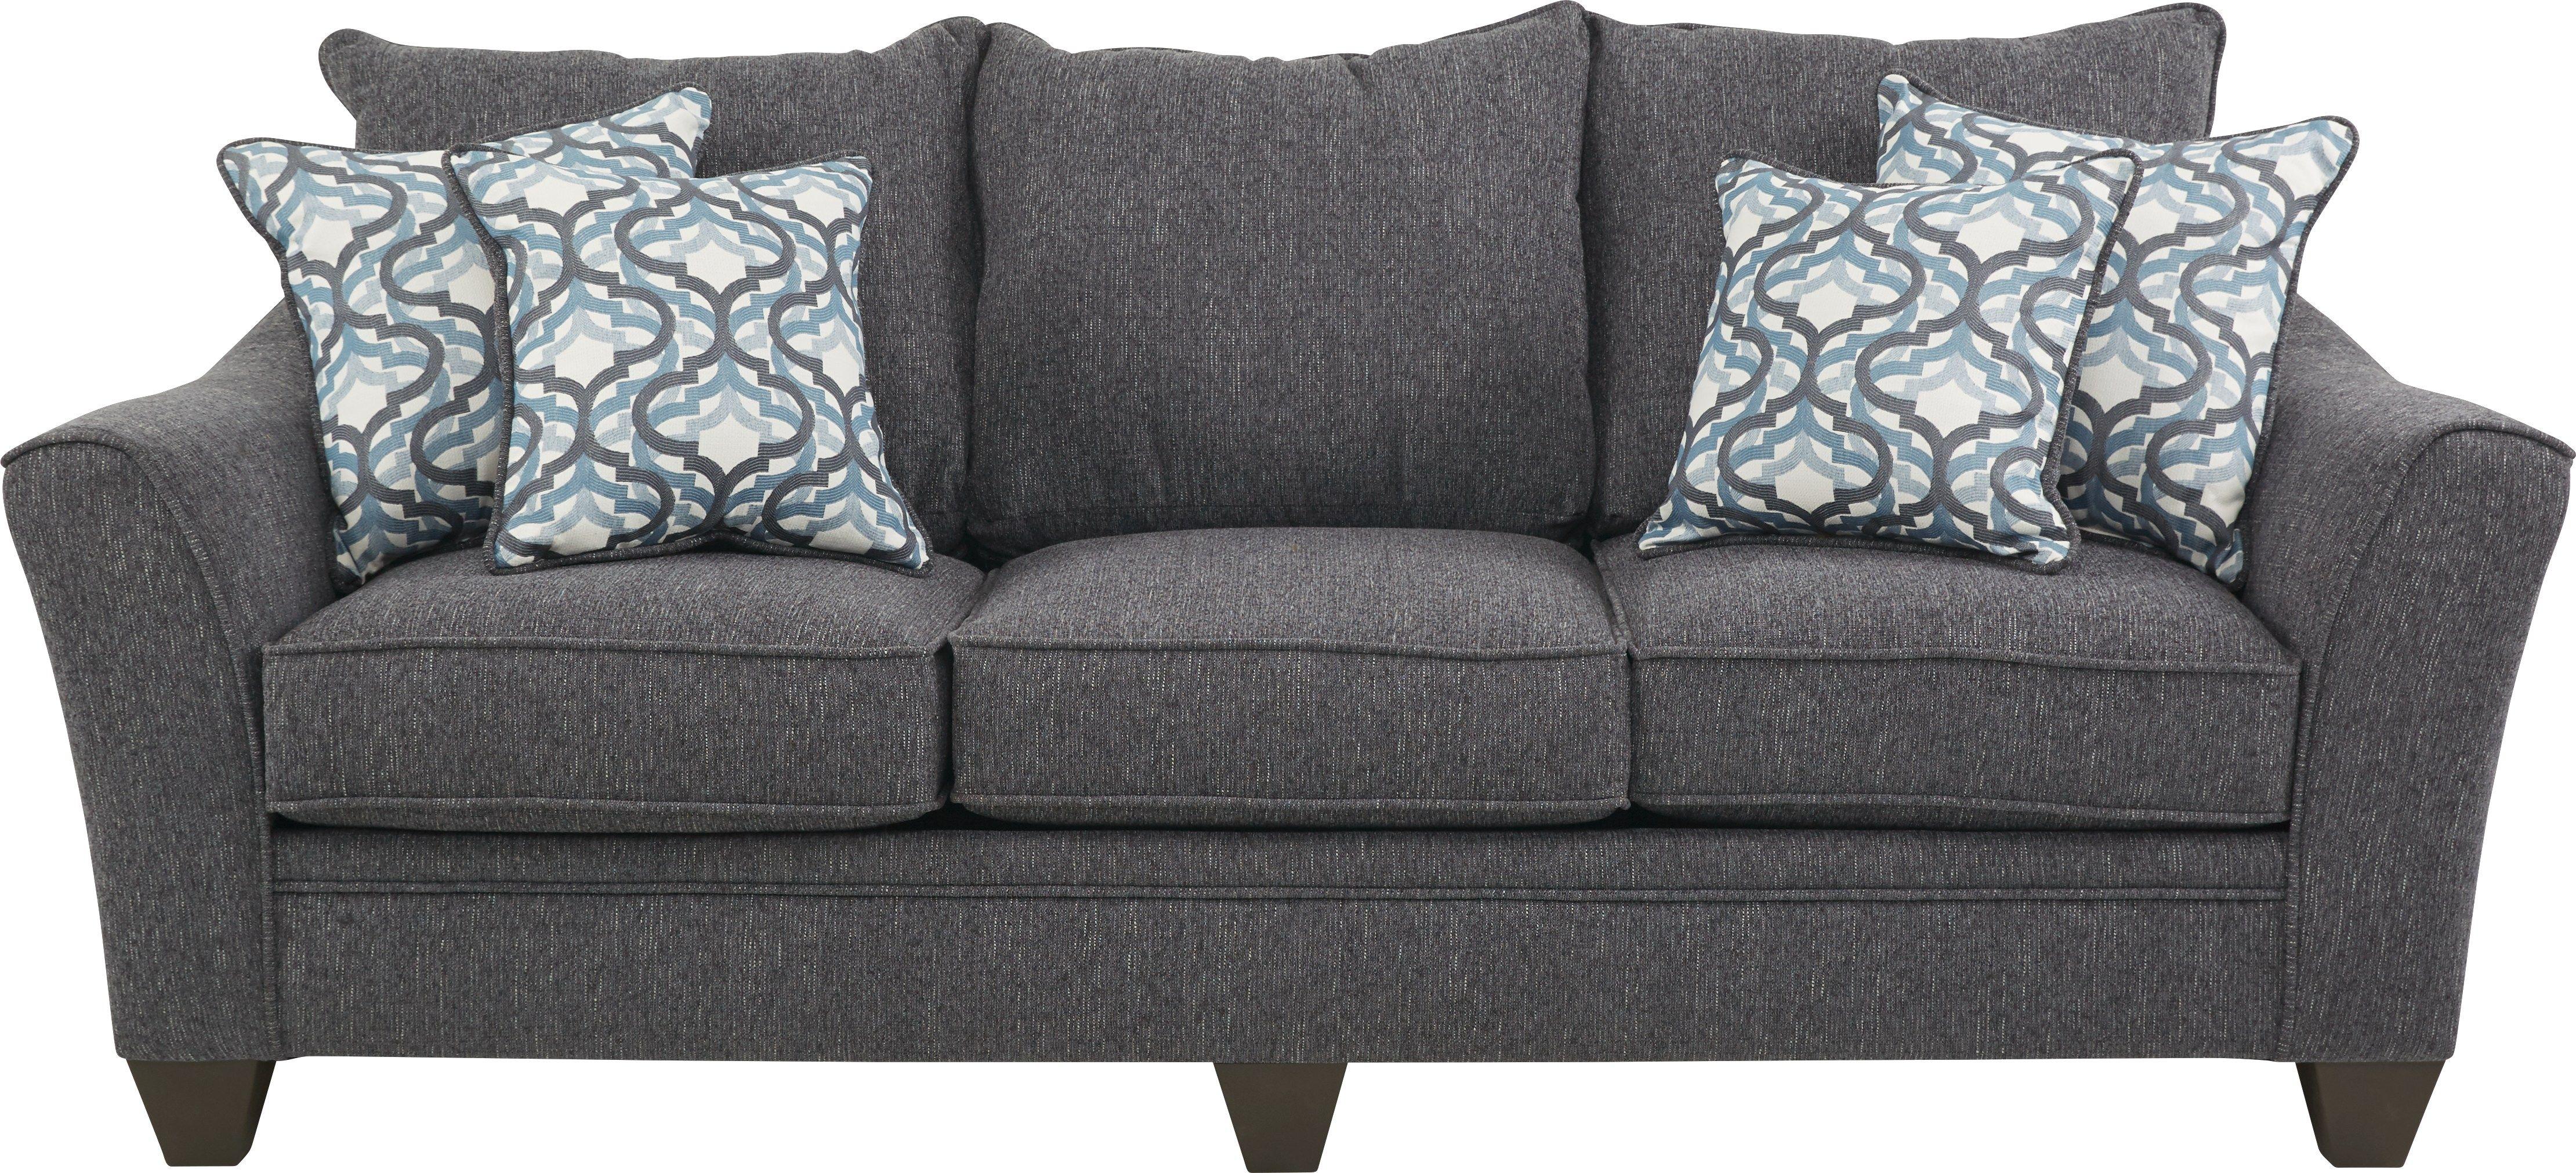 Wondrous Victoria Park Gunmetal Sleeper In 2019 Atl Home Sofa Camellatalisay Diy Chair Ideas Camellatalisaycom